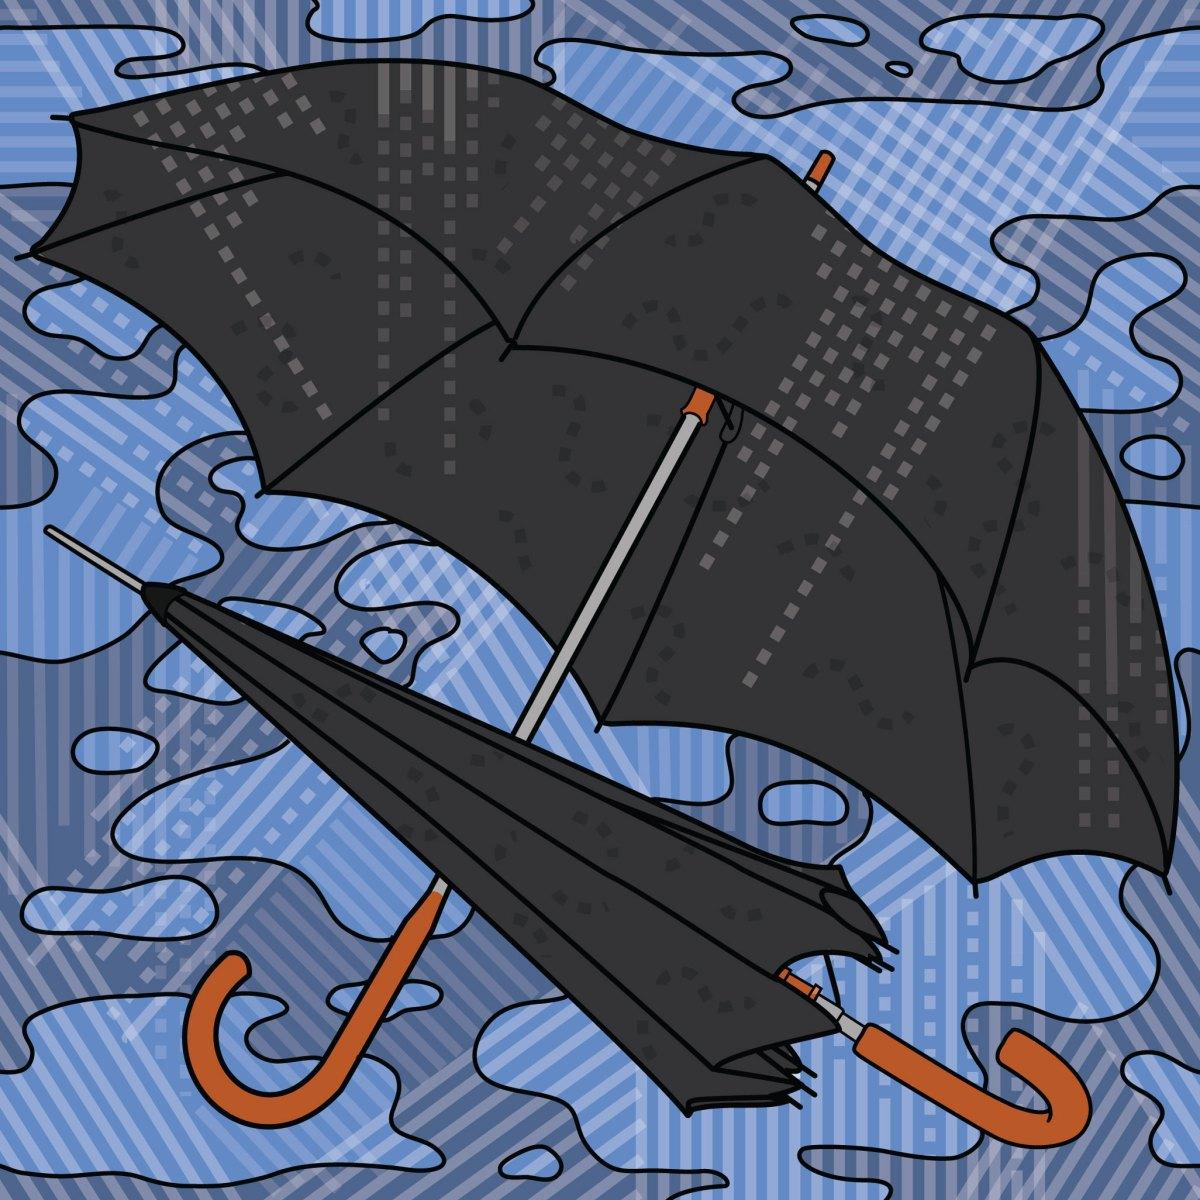 paom-umbrella